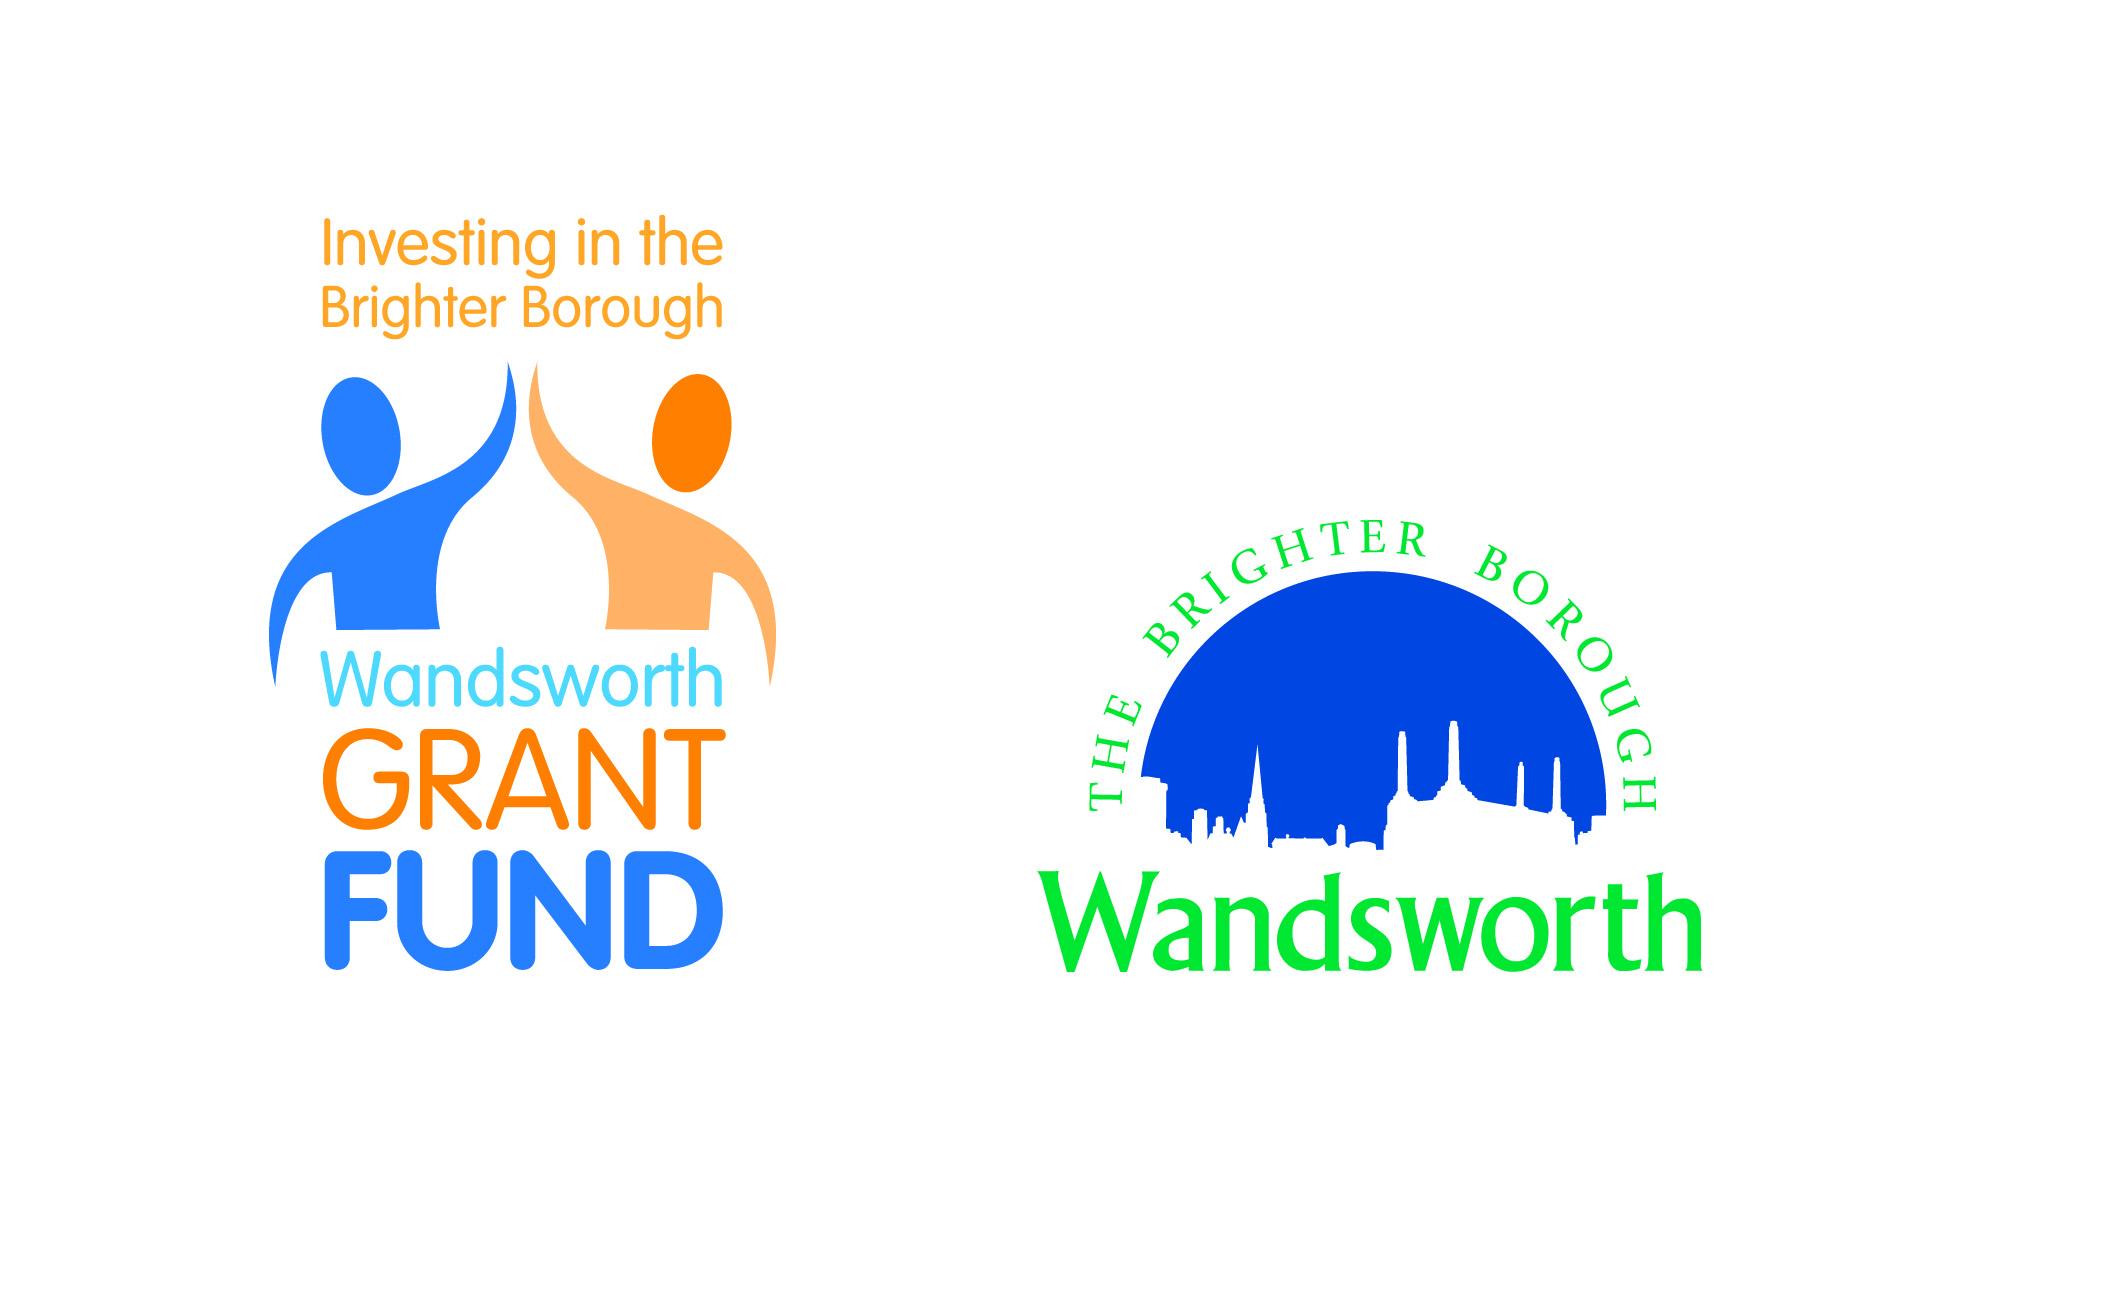 Wandsworh Logos